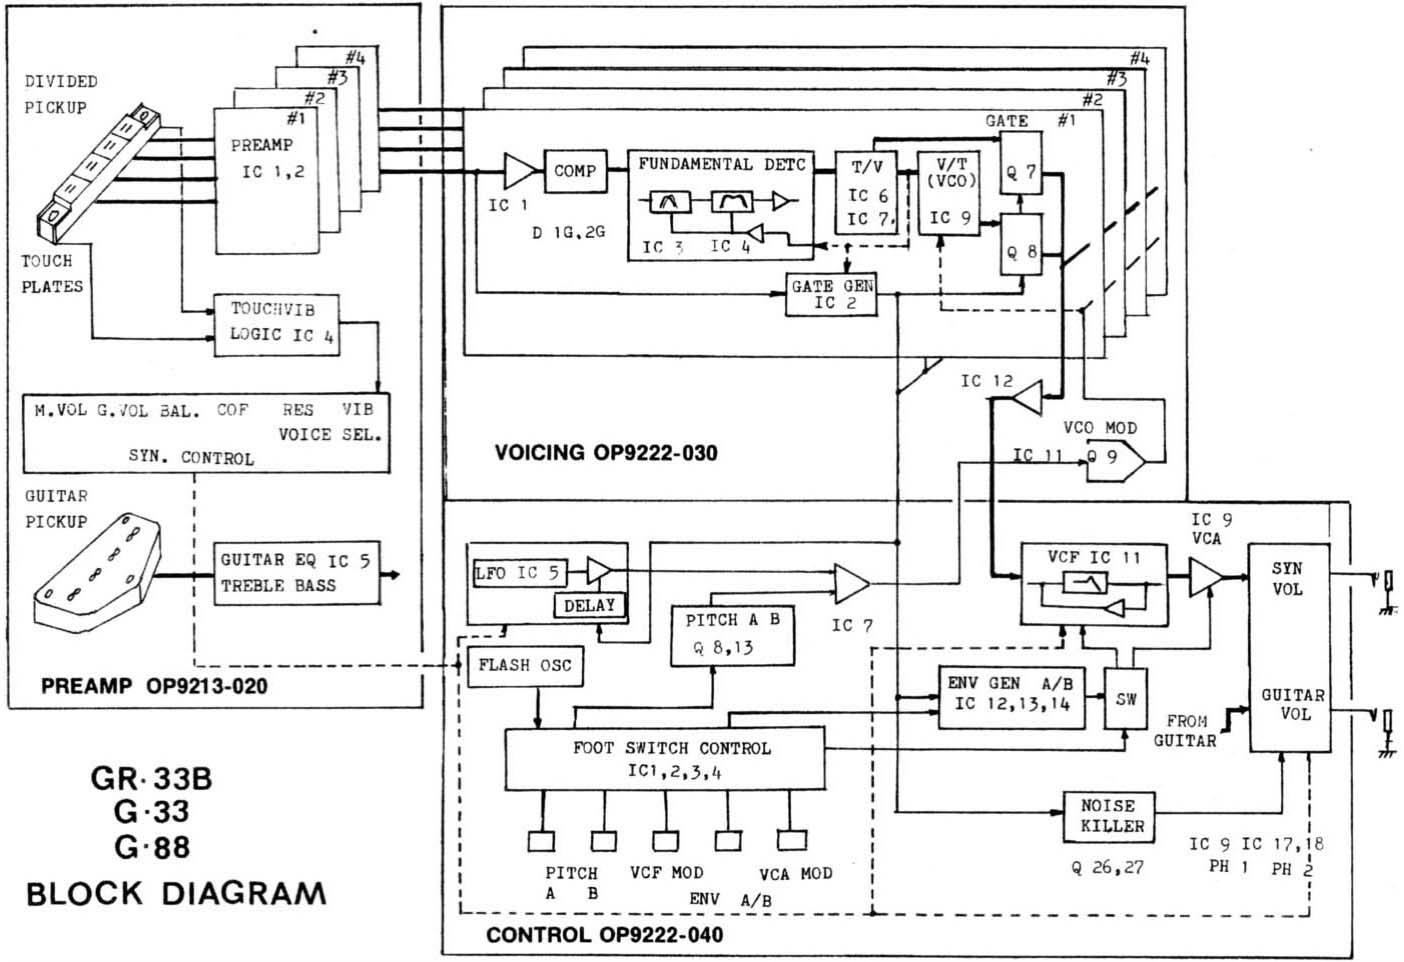 Roland GR-33B Vintage Analog Bass Synthesizer